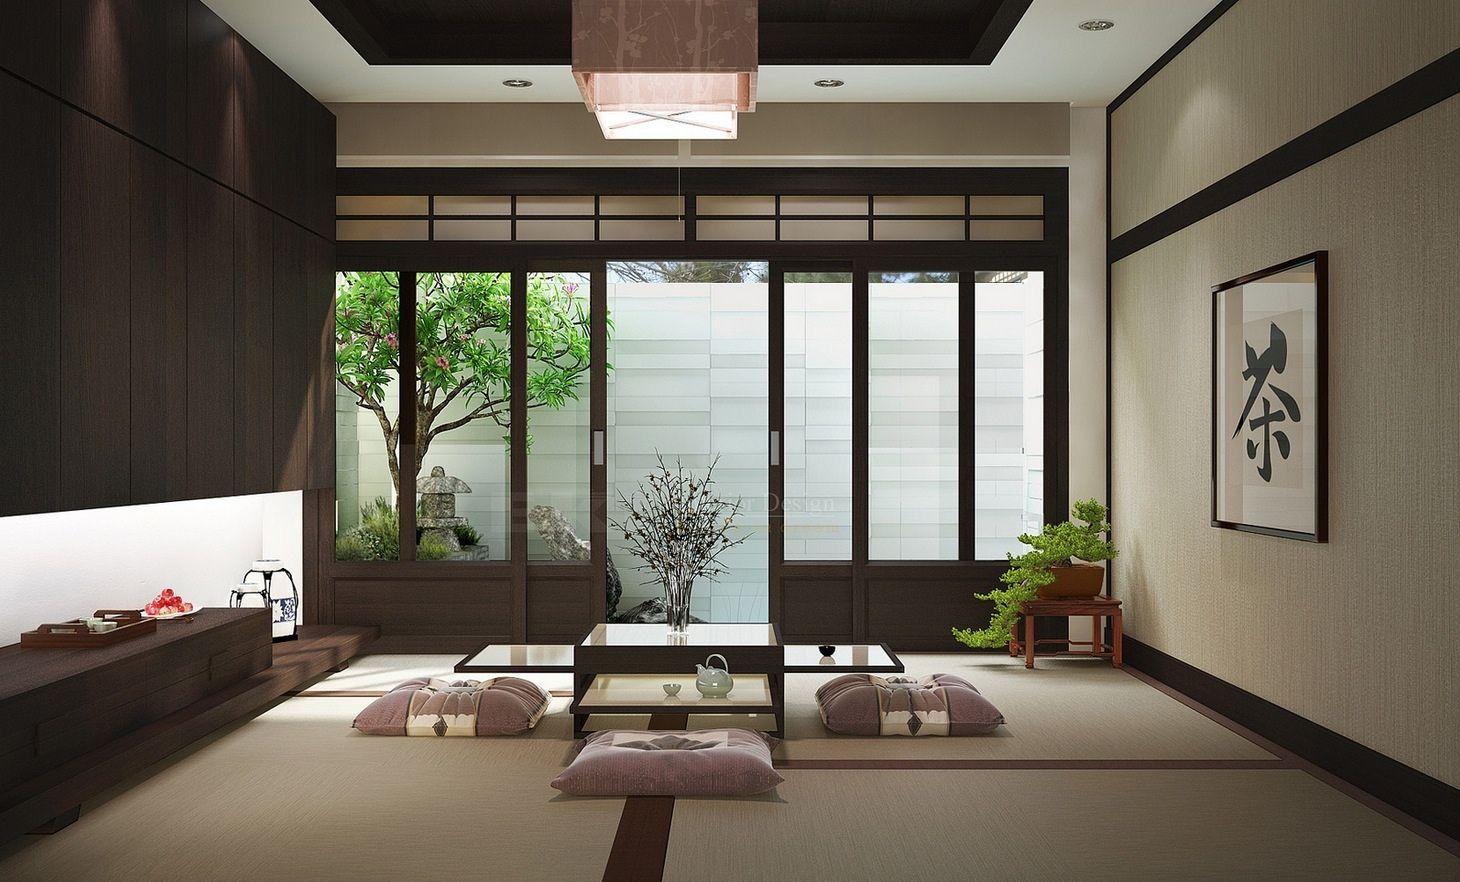 11 Magnificent Zen Interior Design Ideas Zen Interiors Zen Living Rooms Asian Interior Design